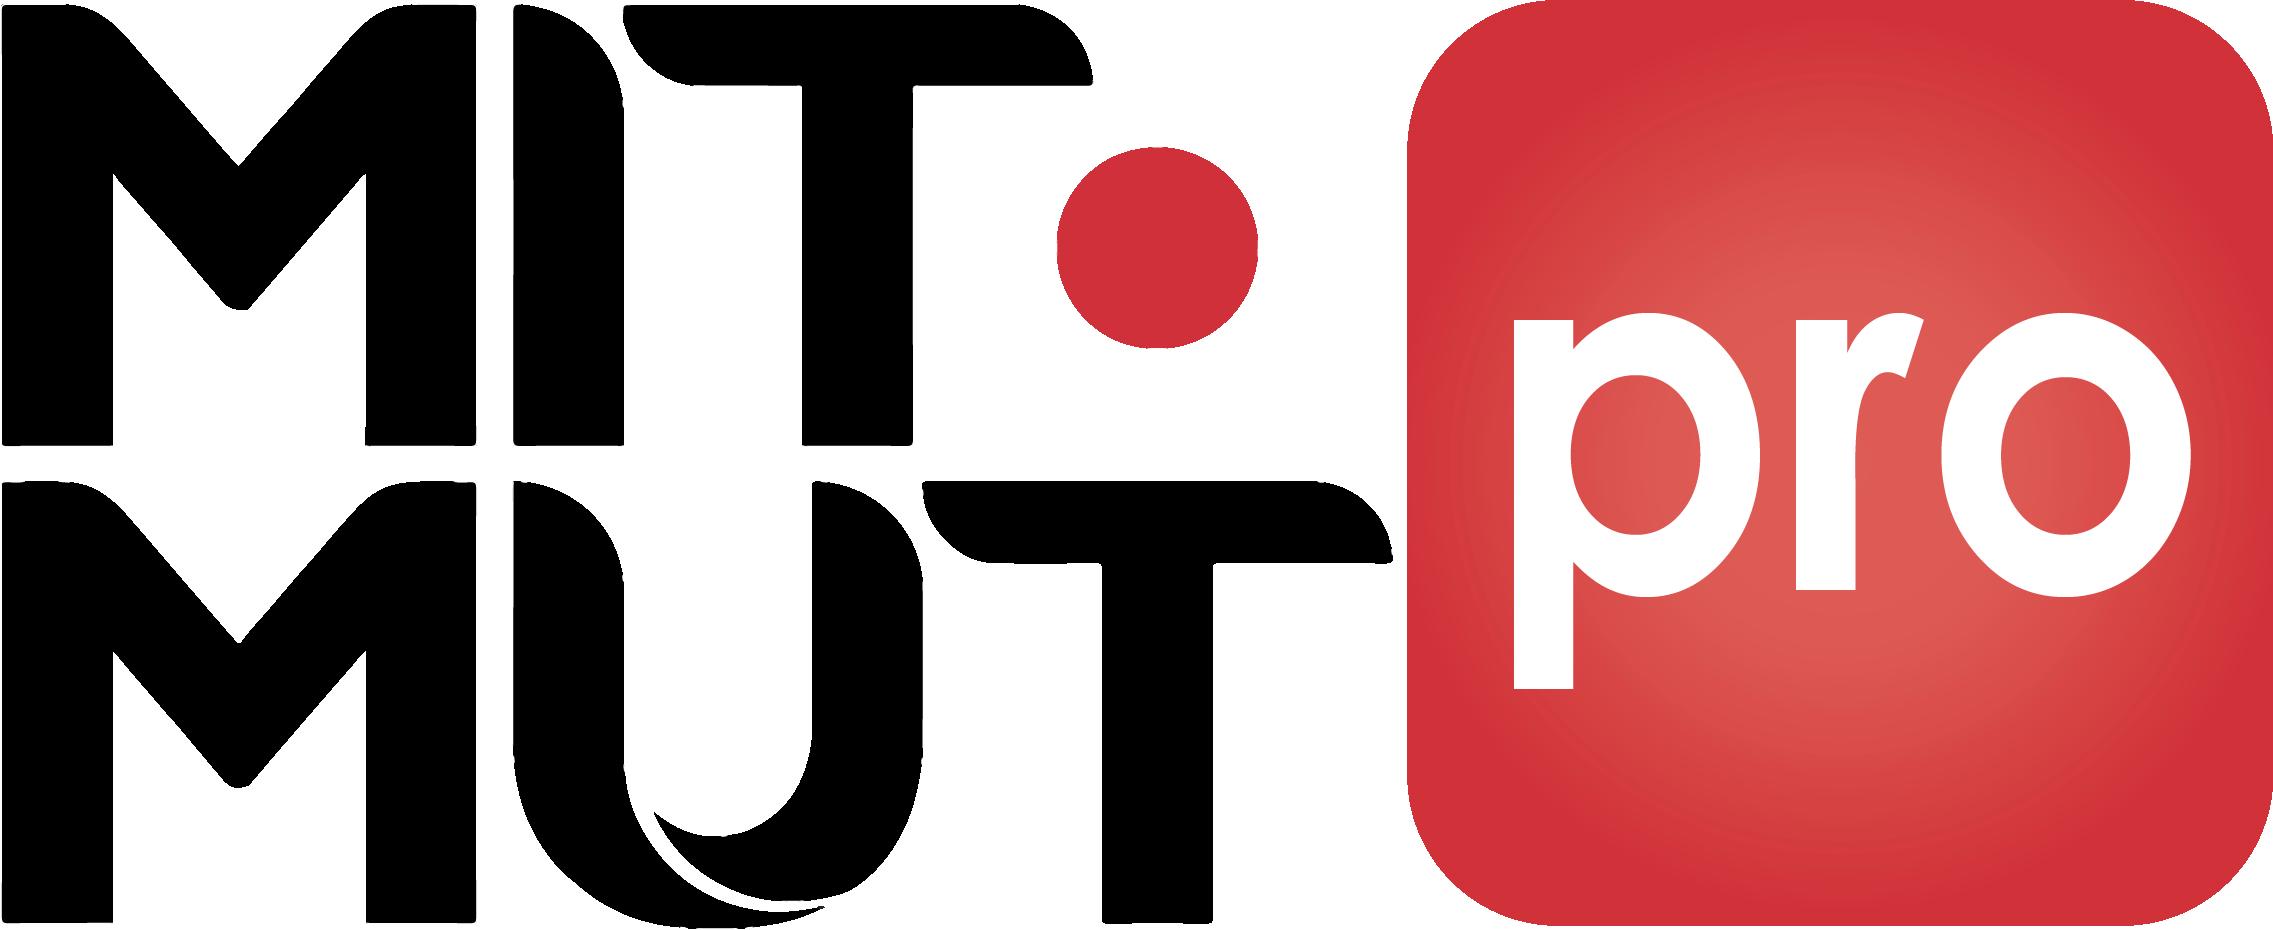 Logo negro MitMutpro final